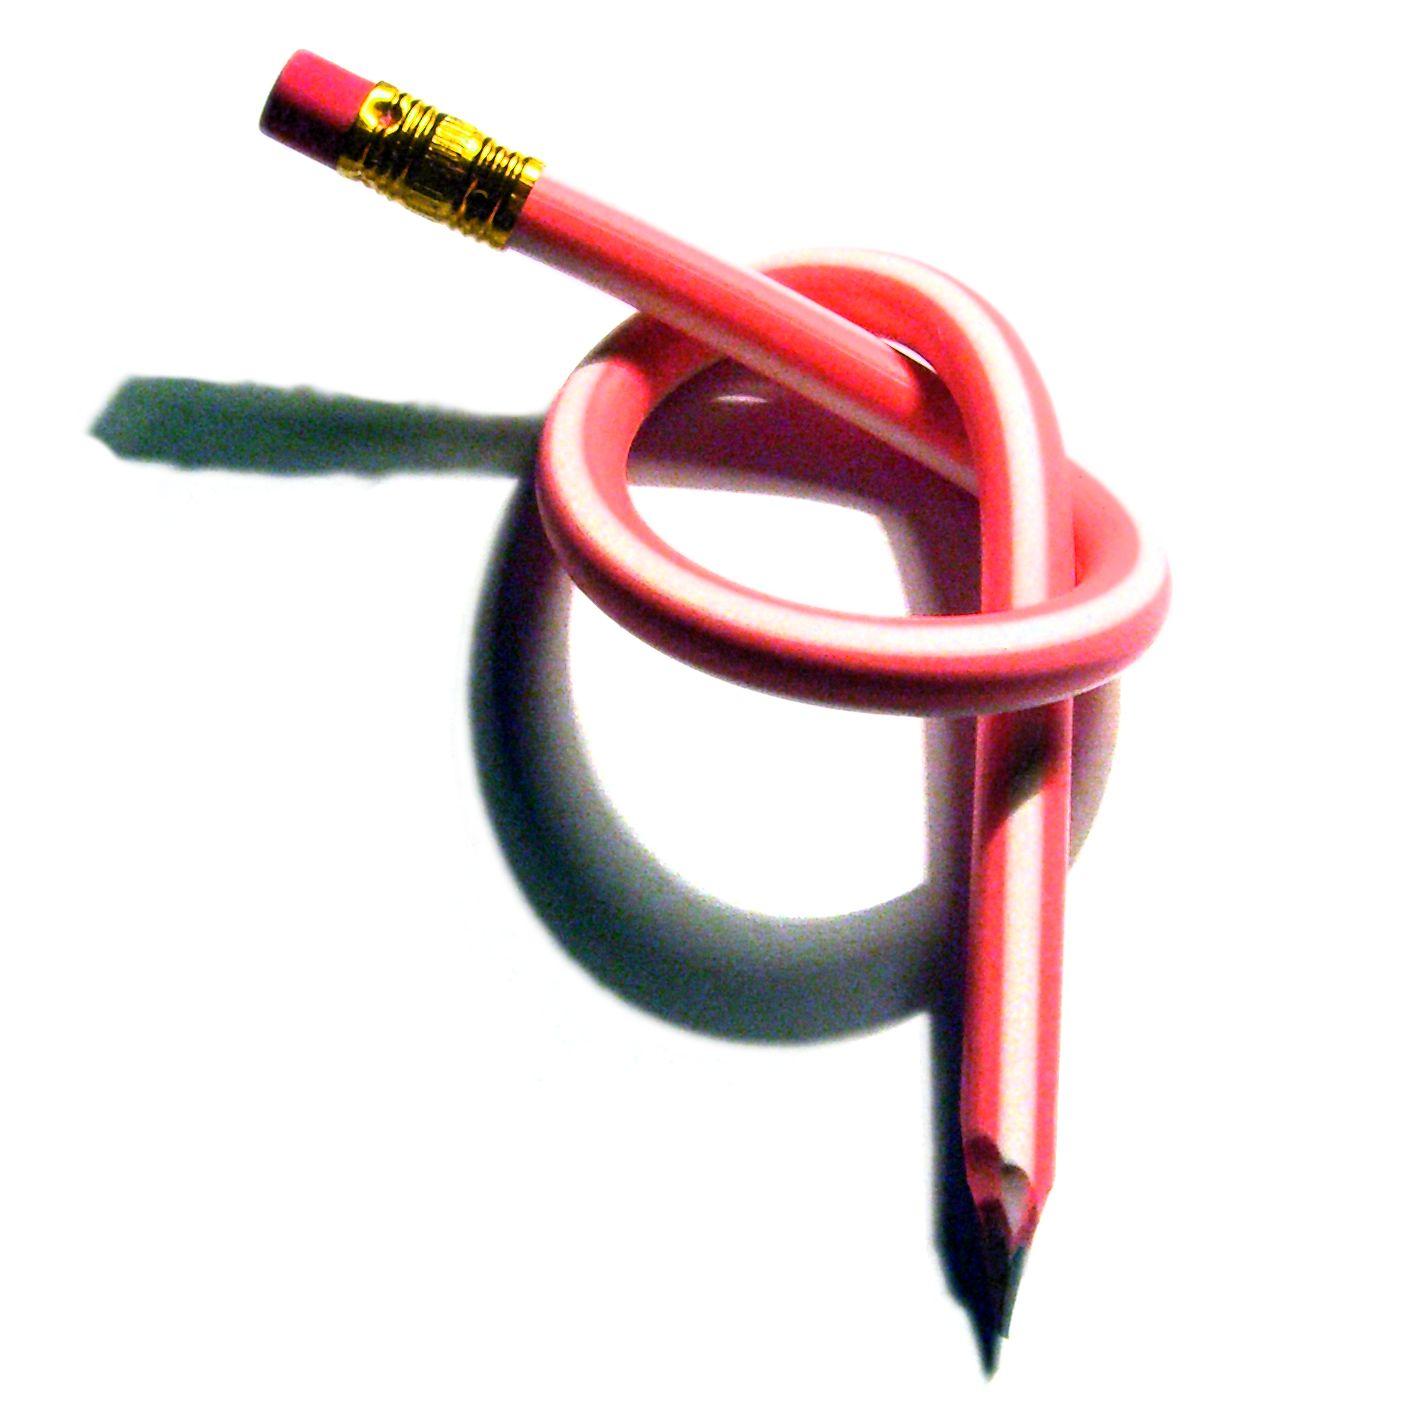 Tok essay help may 2013